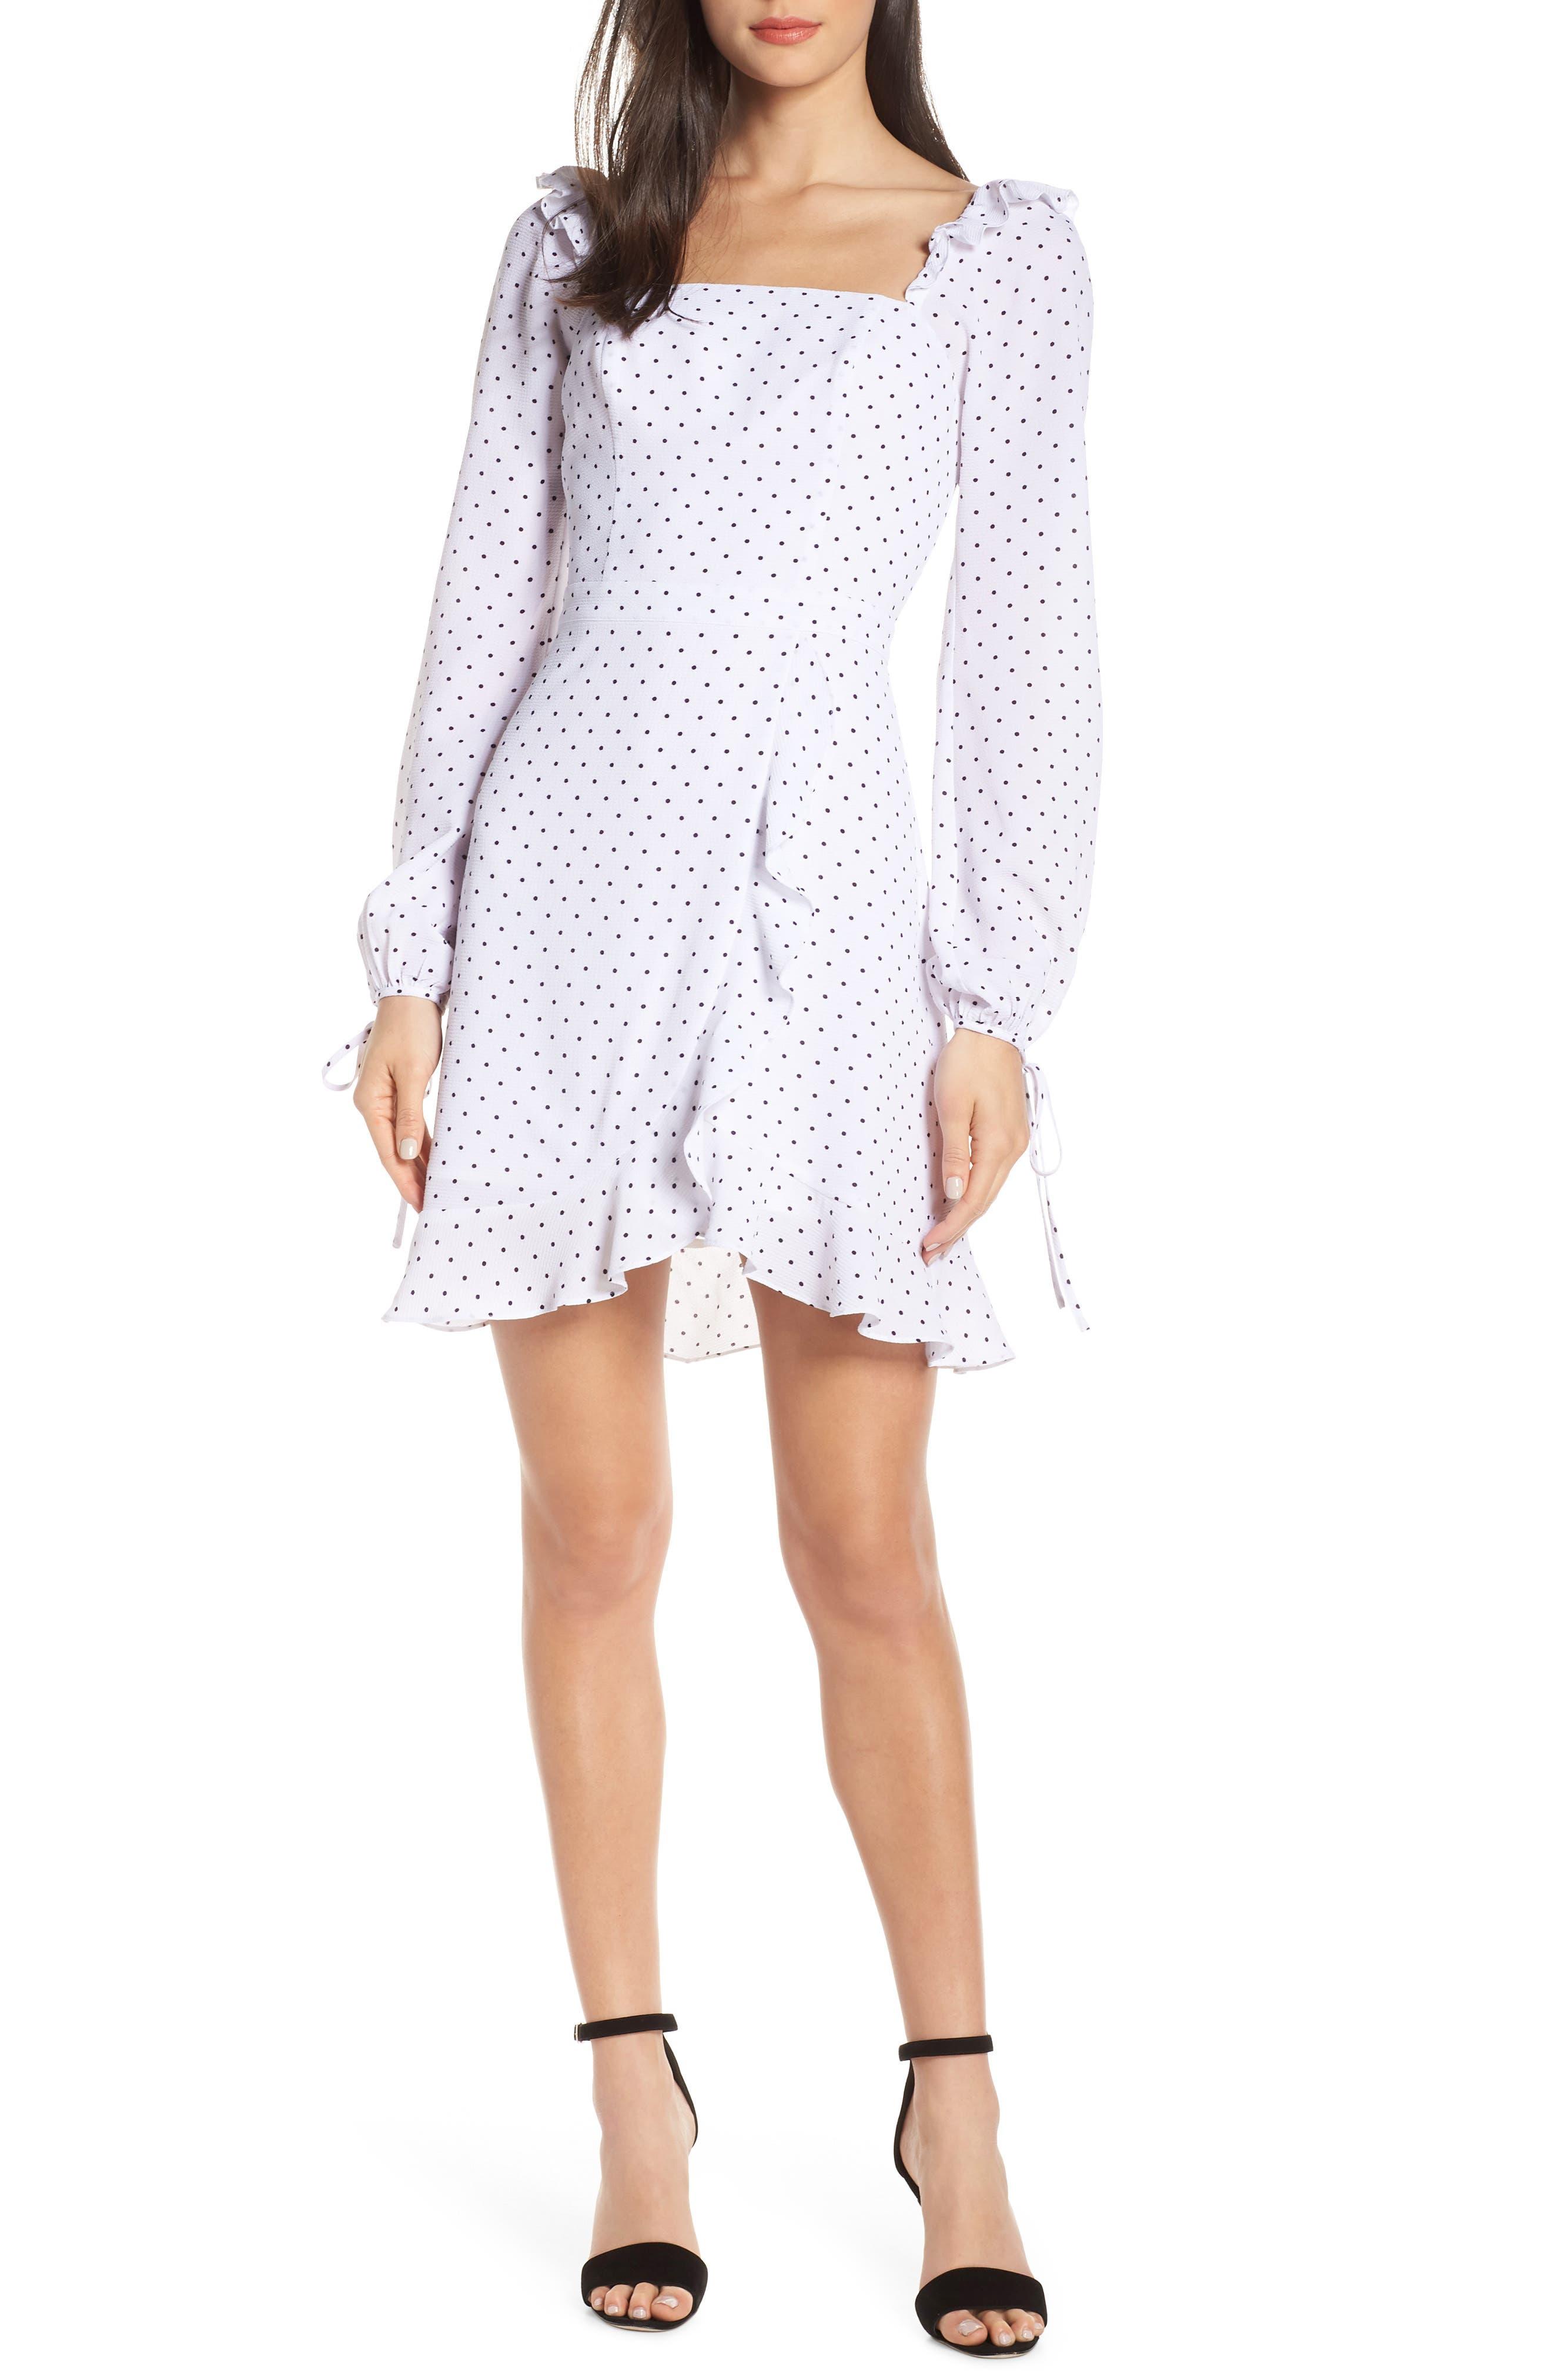 ALI & JAY In Bloom Polka Dot Asymmetrical Dress, Main, color, 100